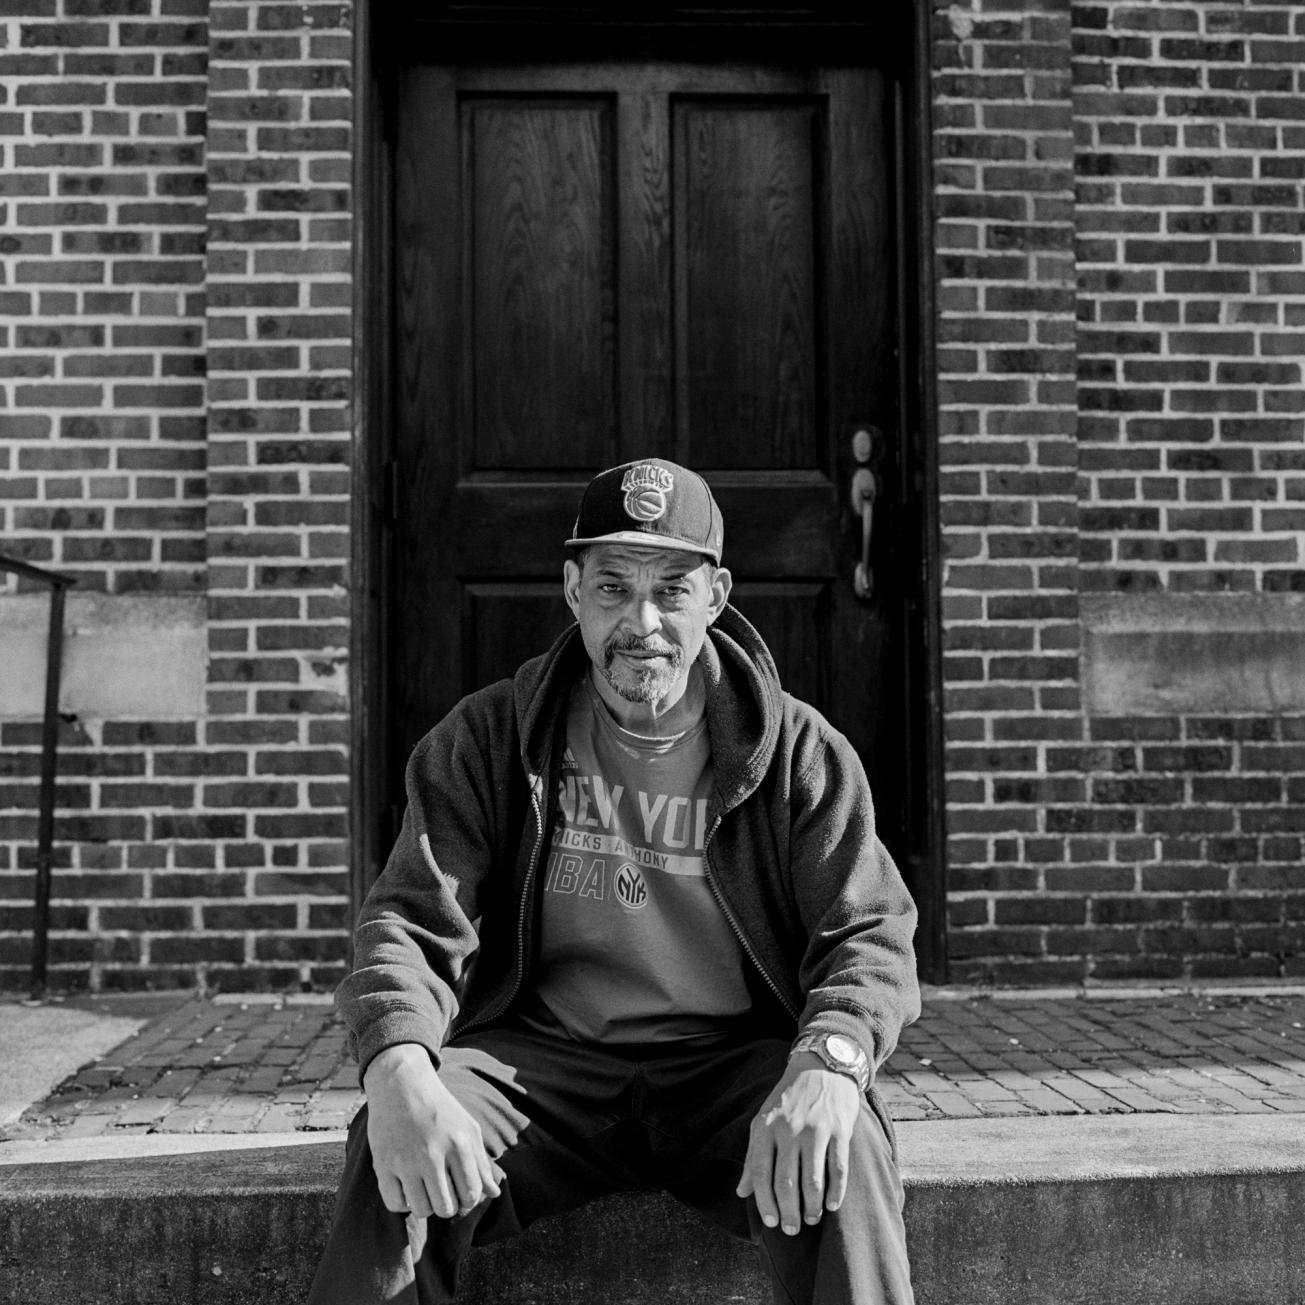 Connie Bobbit. Bedford Stuyvesant, Brooklyn. April 13, 2016